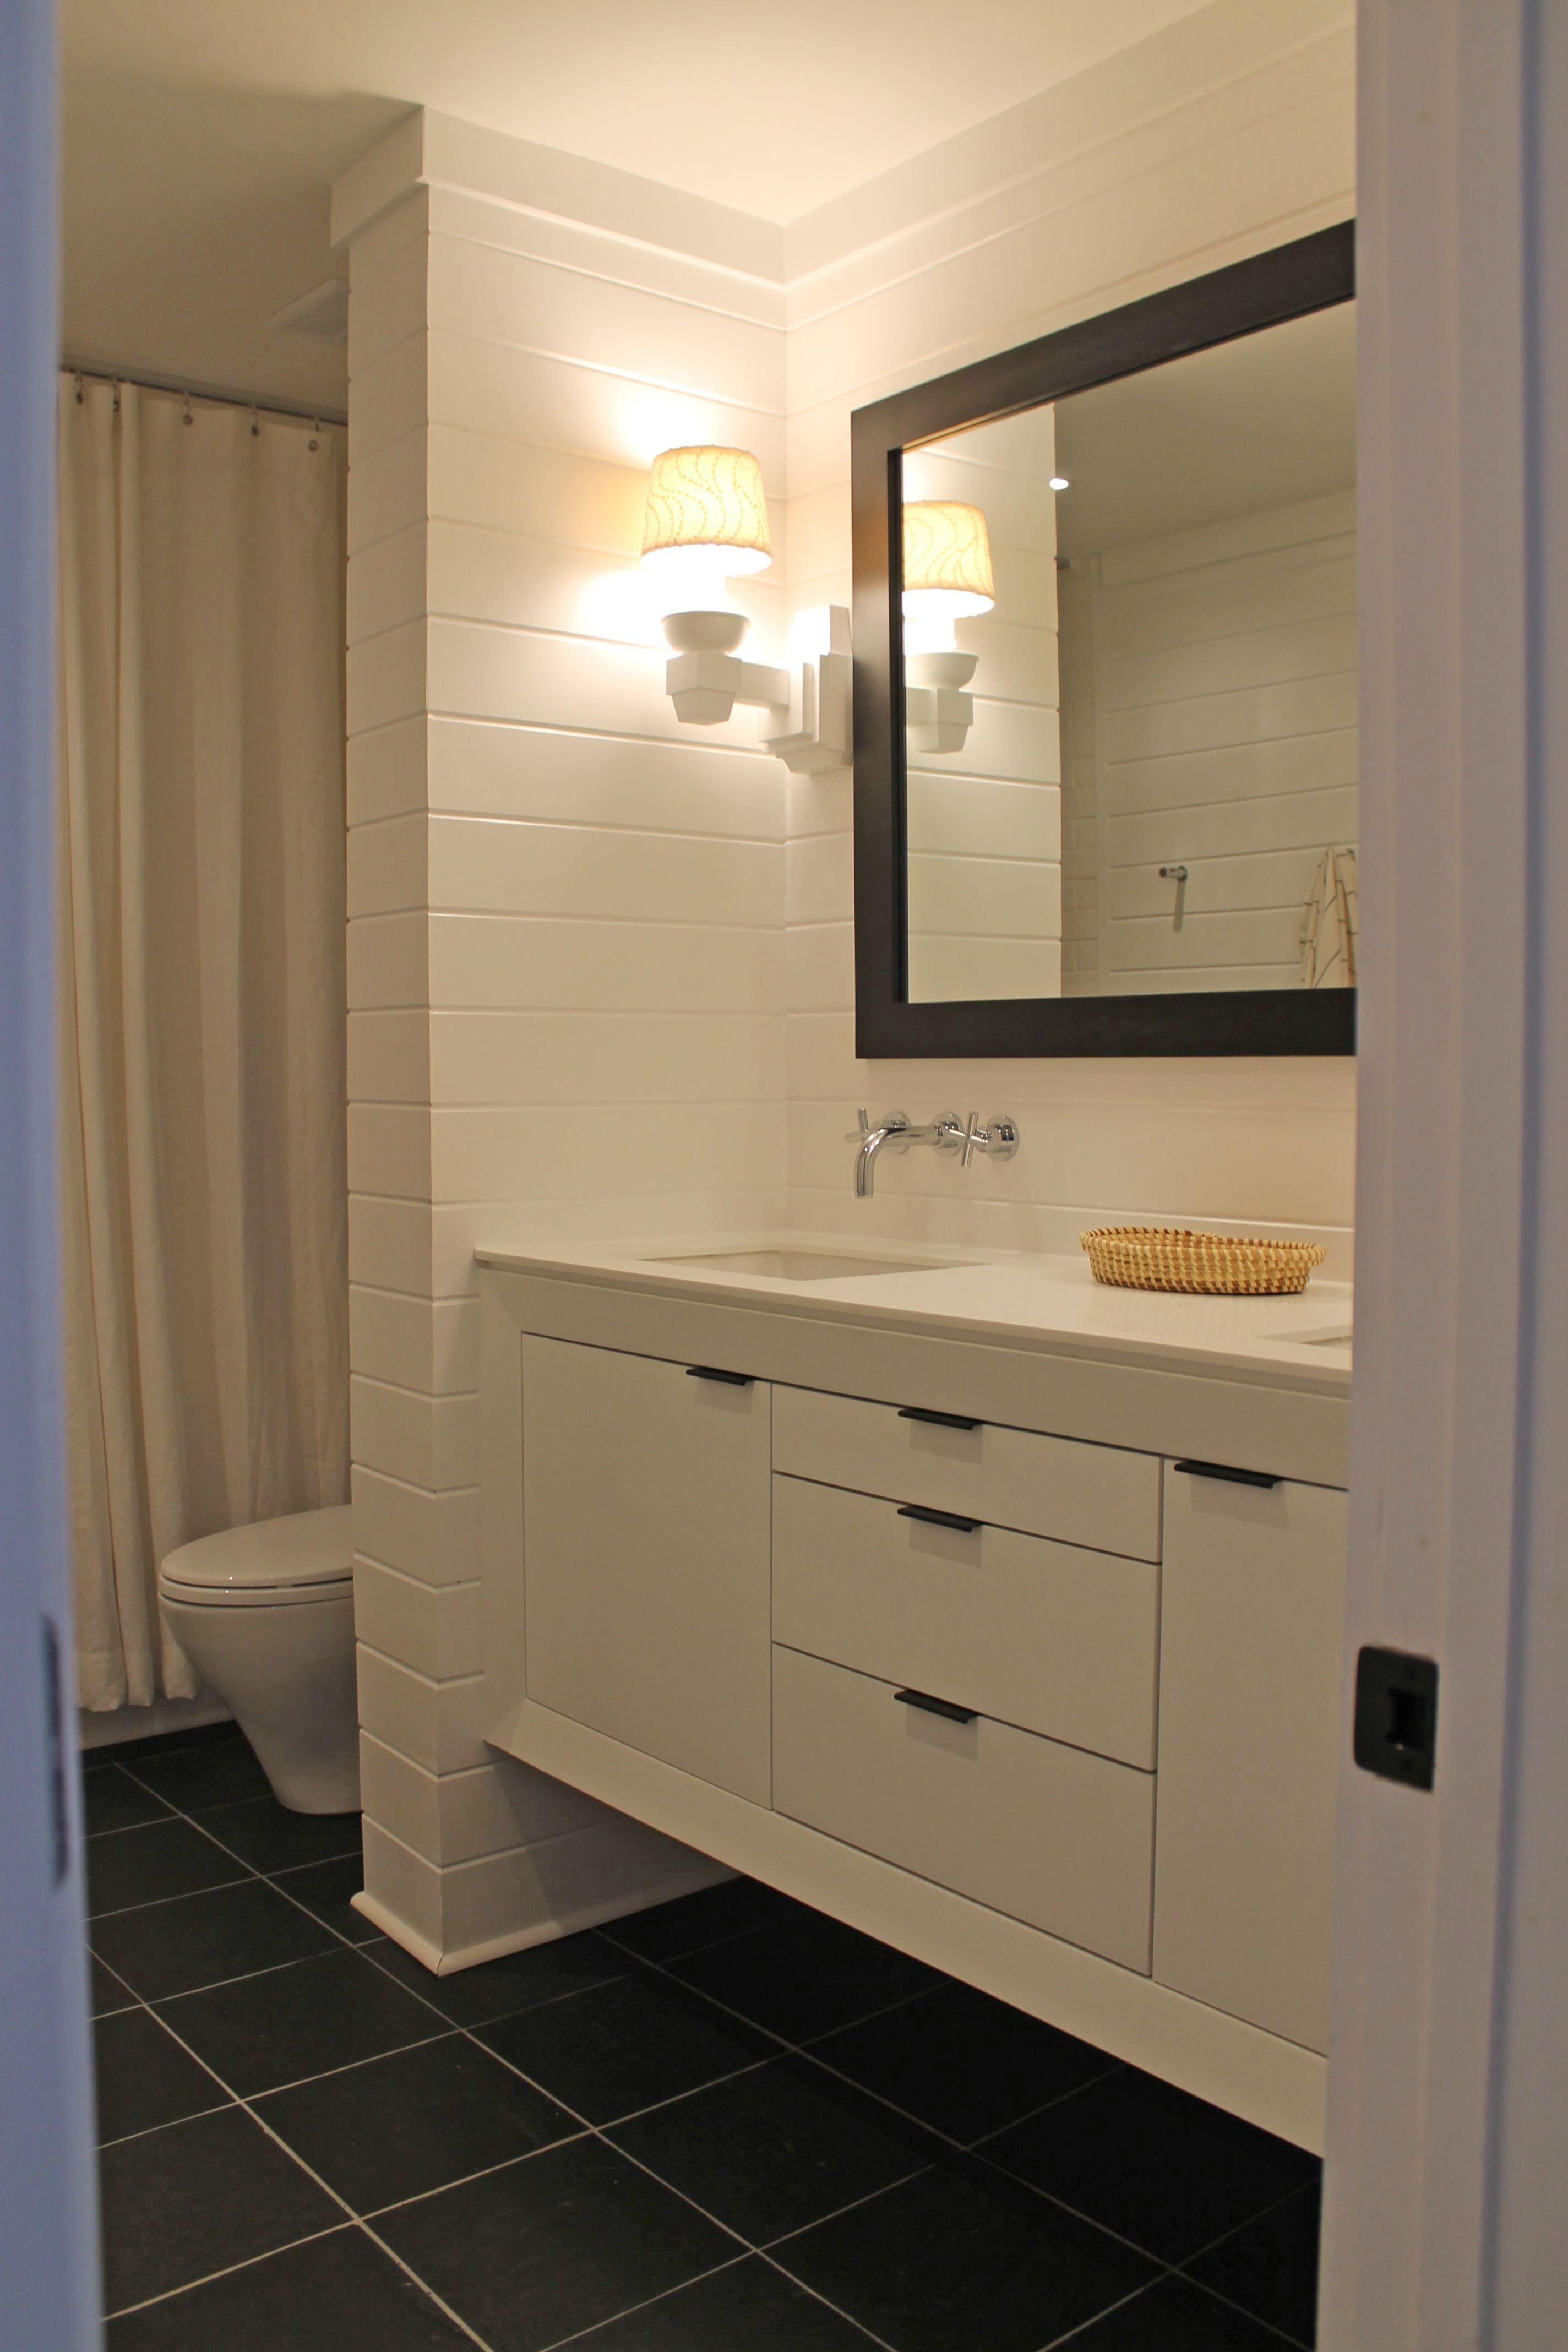 Bathroom Organization Ideas Also Image Of Bathroom Remodel Birmingham. Bathroom Design Birmingham  Bathrooms Birmingham Mucklow Hill